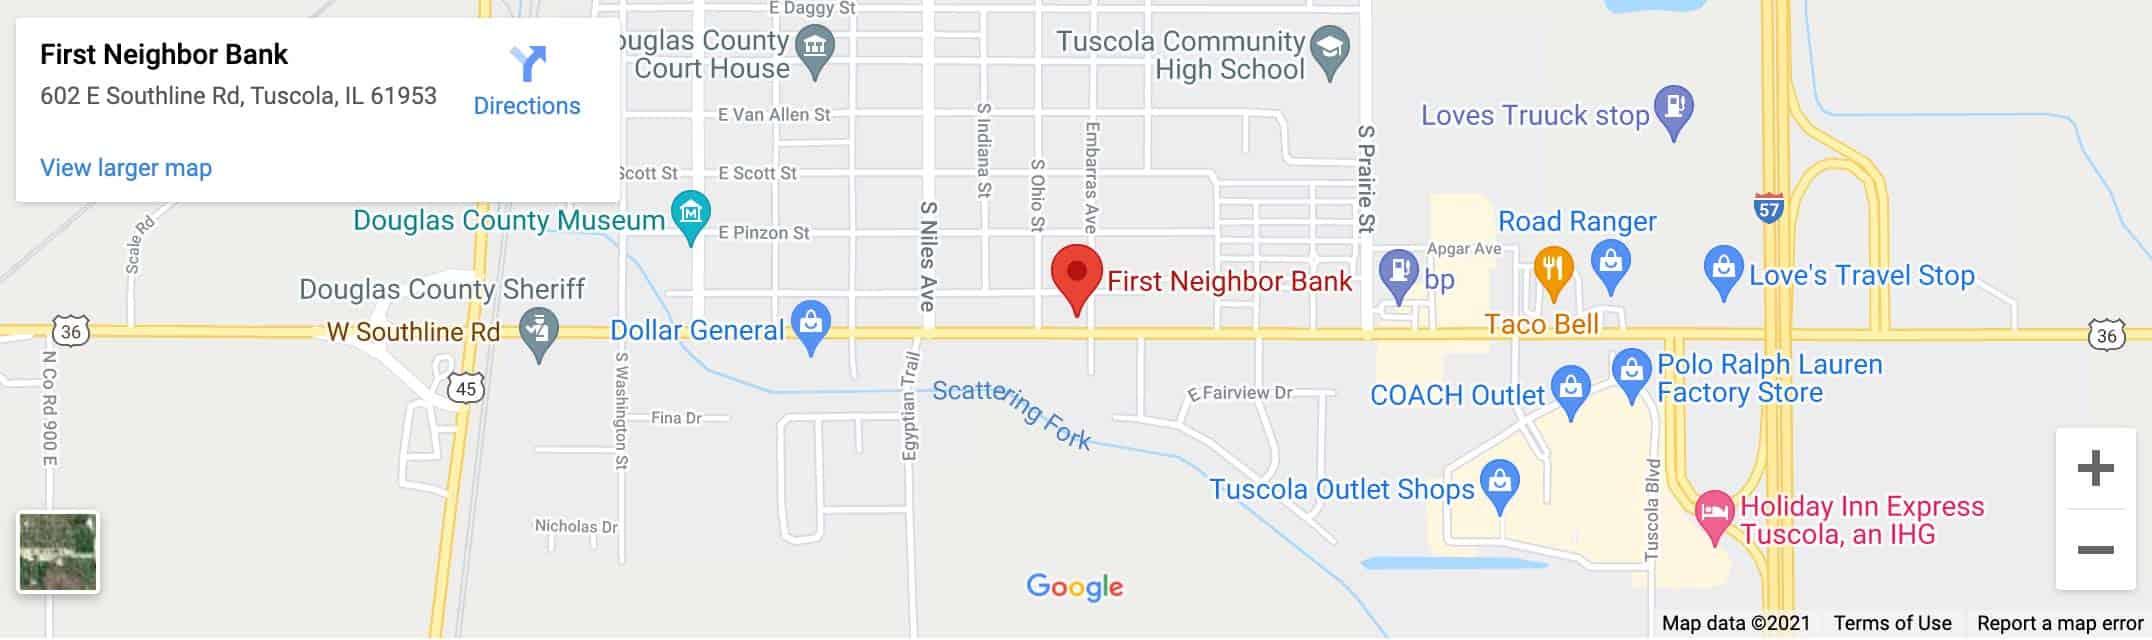 Decorative - First Neighbor Bank Tuscola Google Map Image